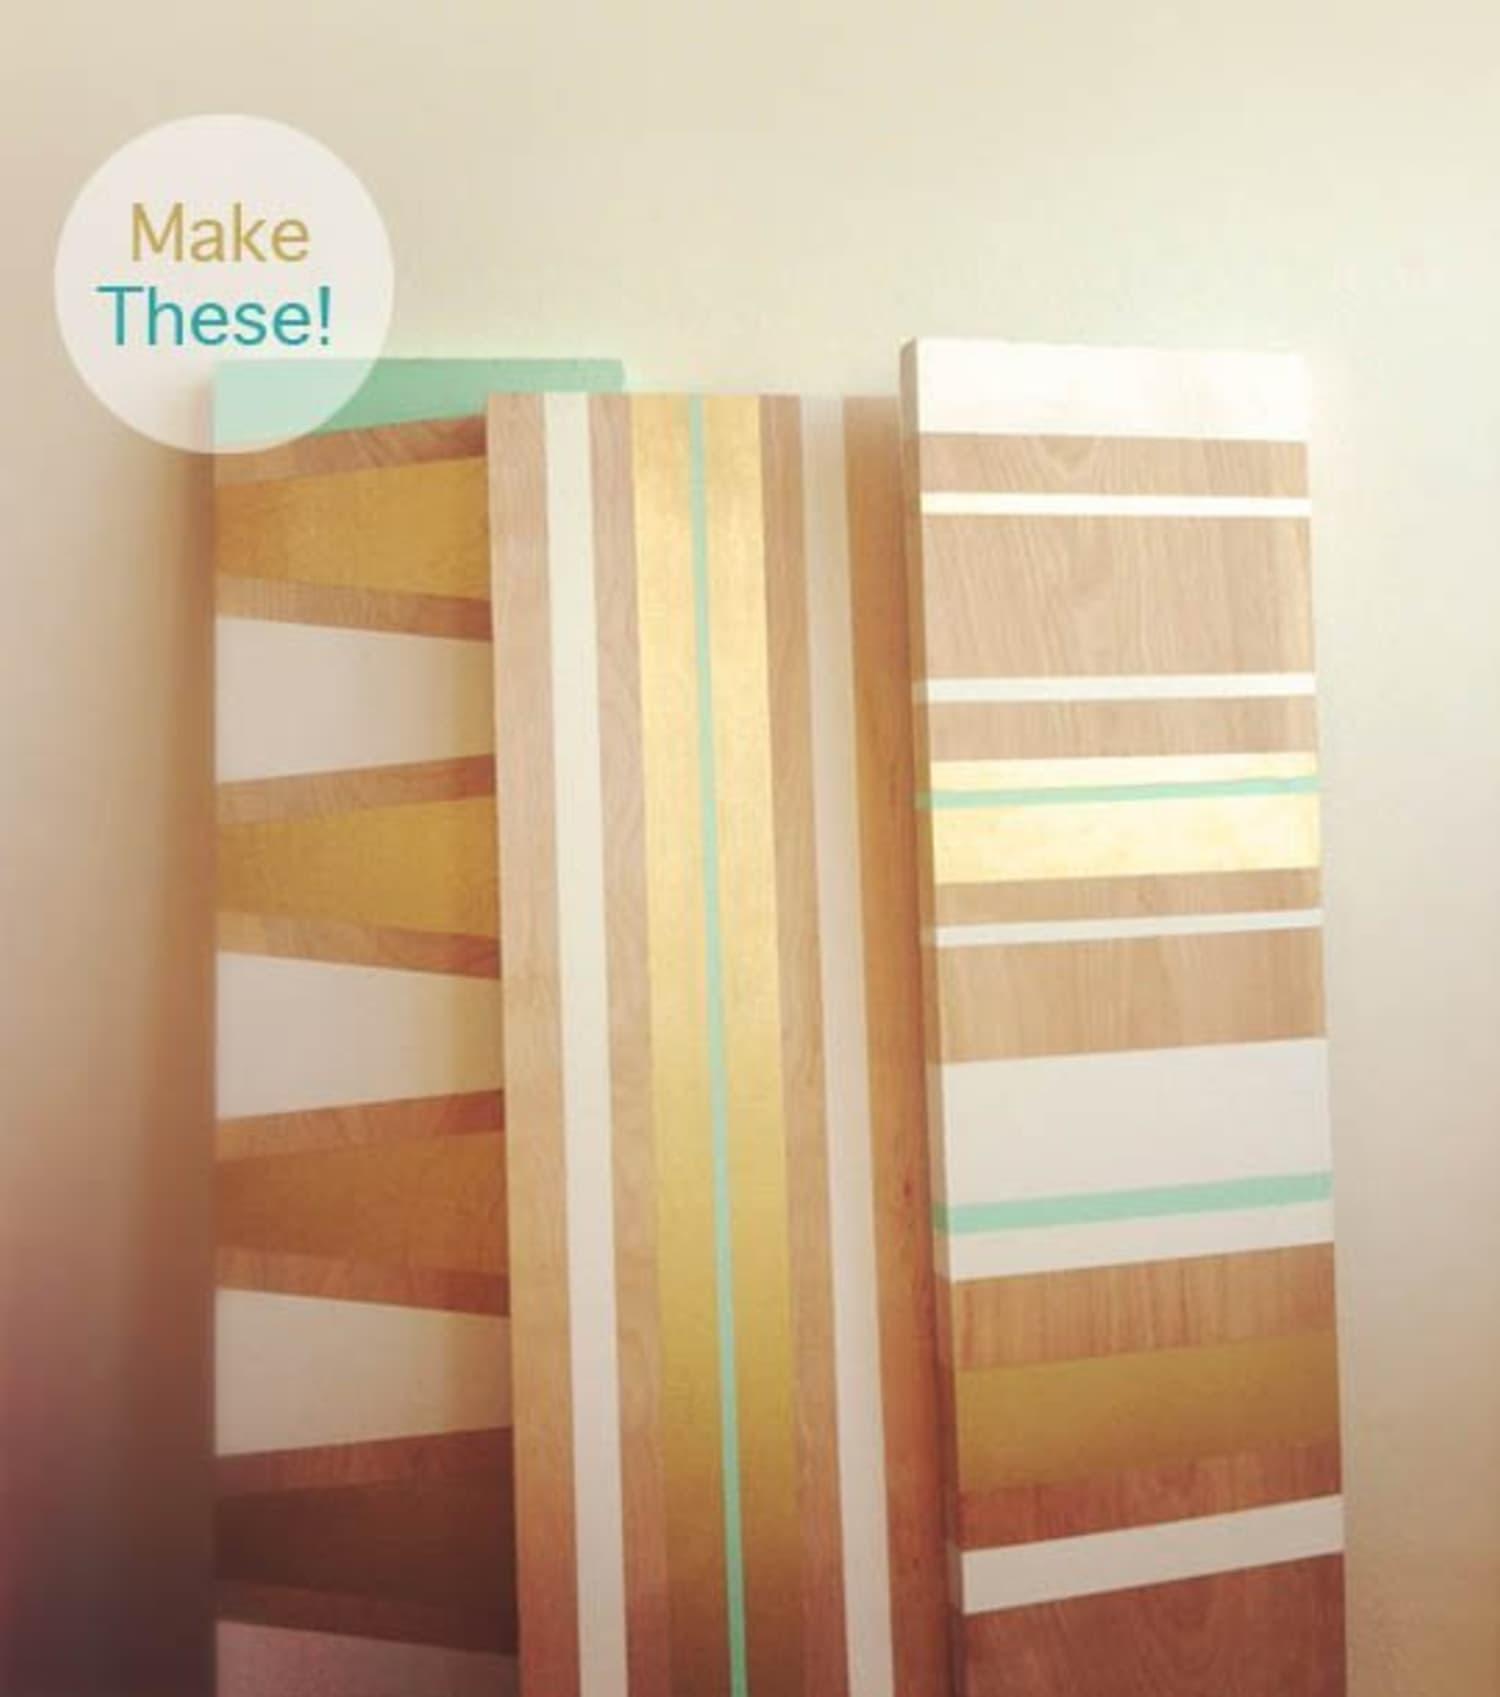 Mid Century Modern Los Angeles Apartment: Make It Organized: 10 DIY Wall Shelving & Storage Ideas